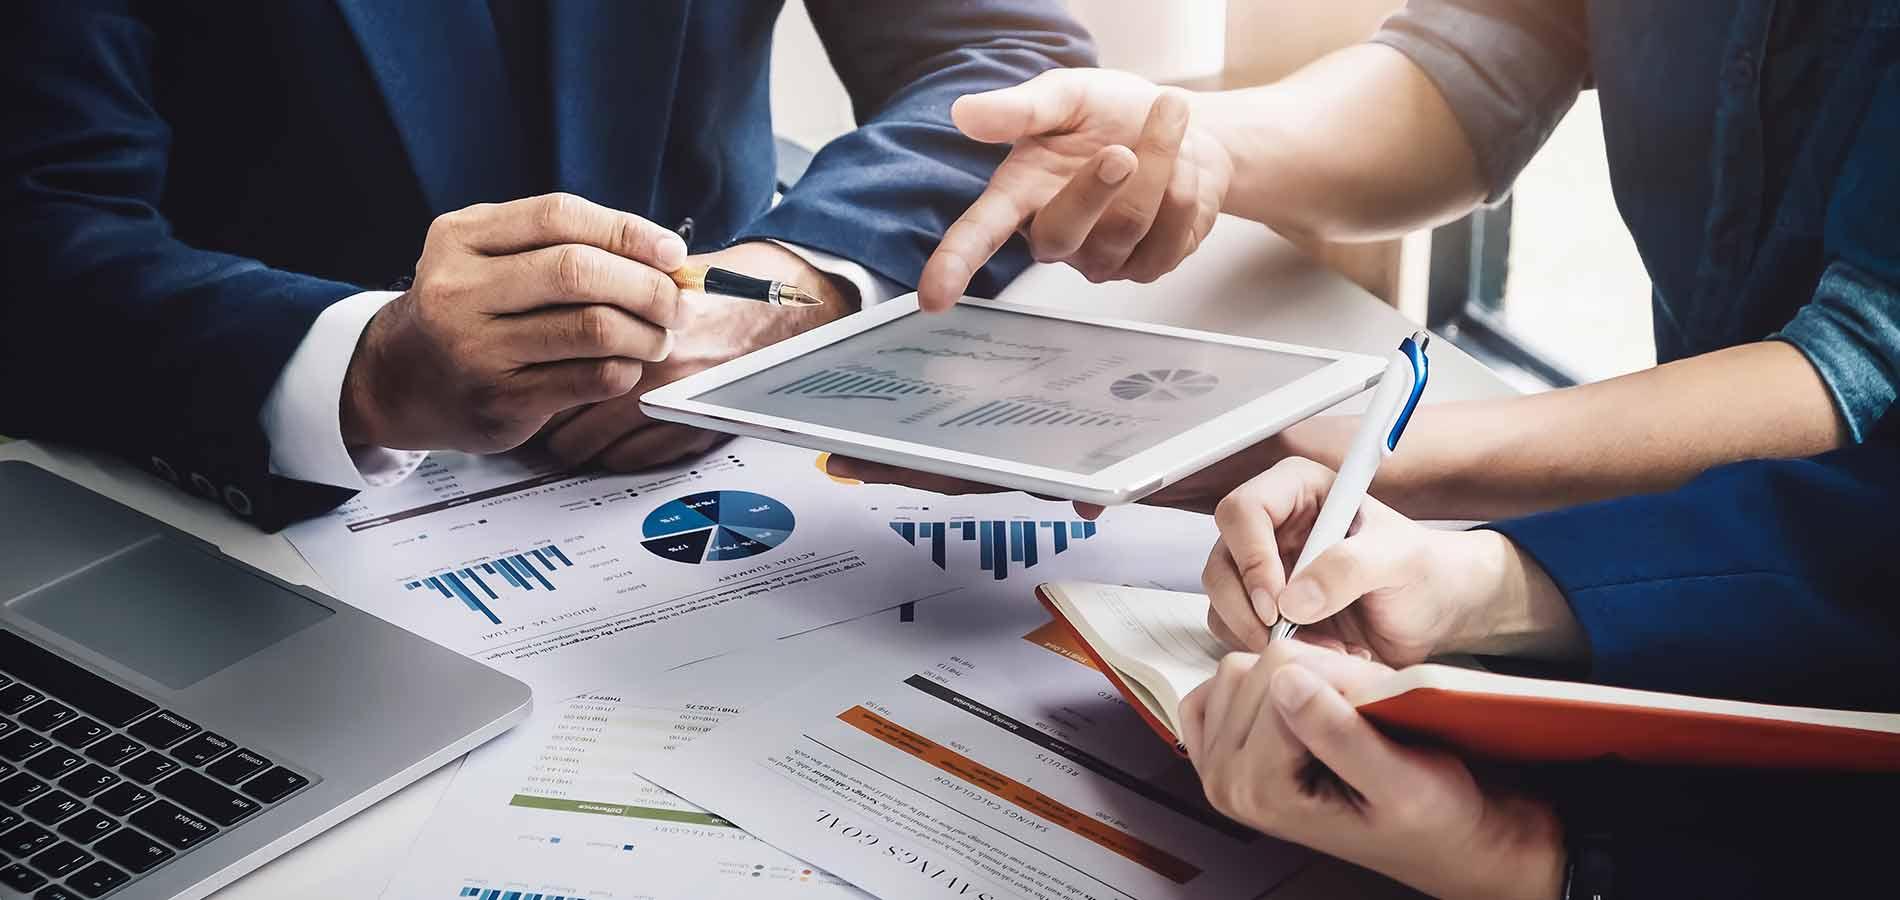 Digital marketing jobs in demand